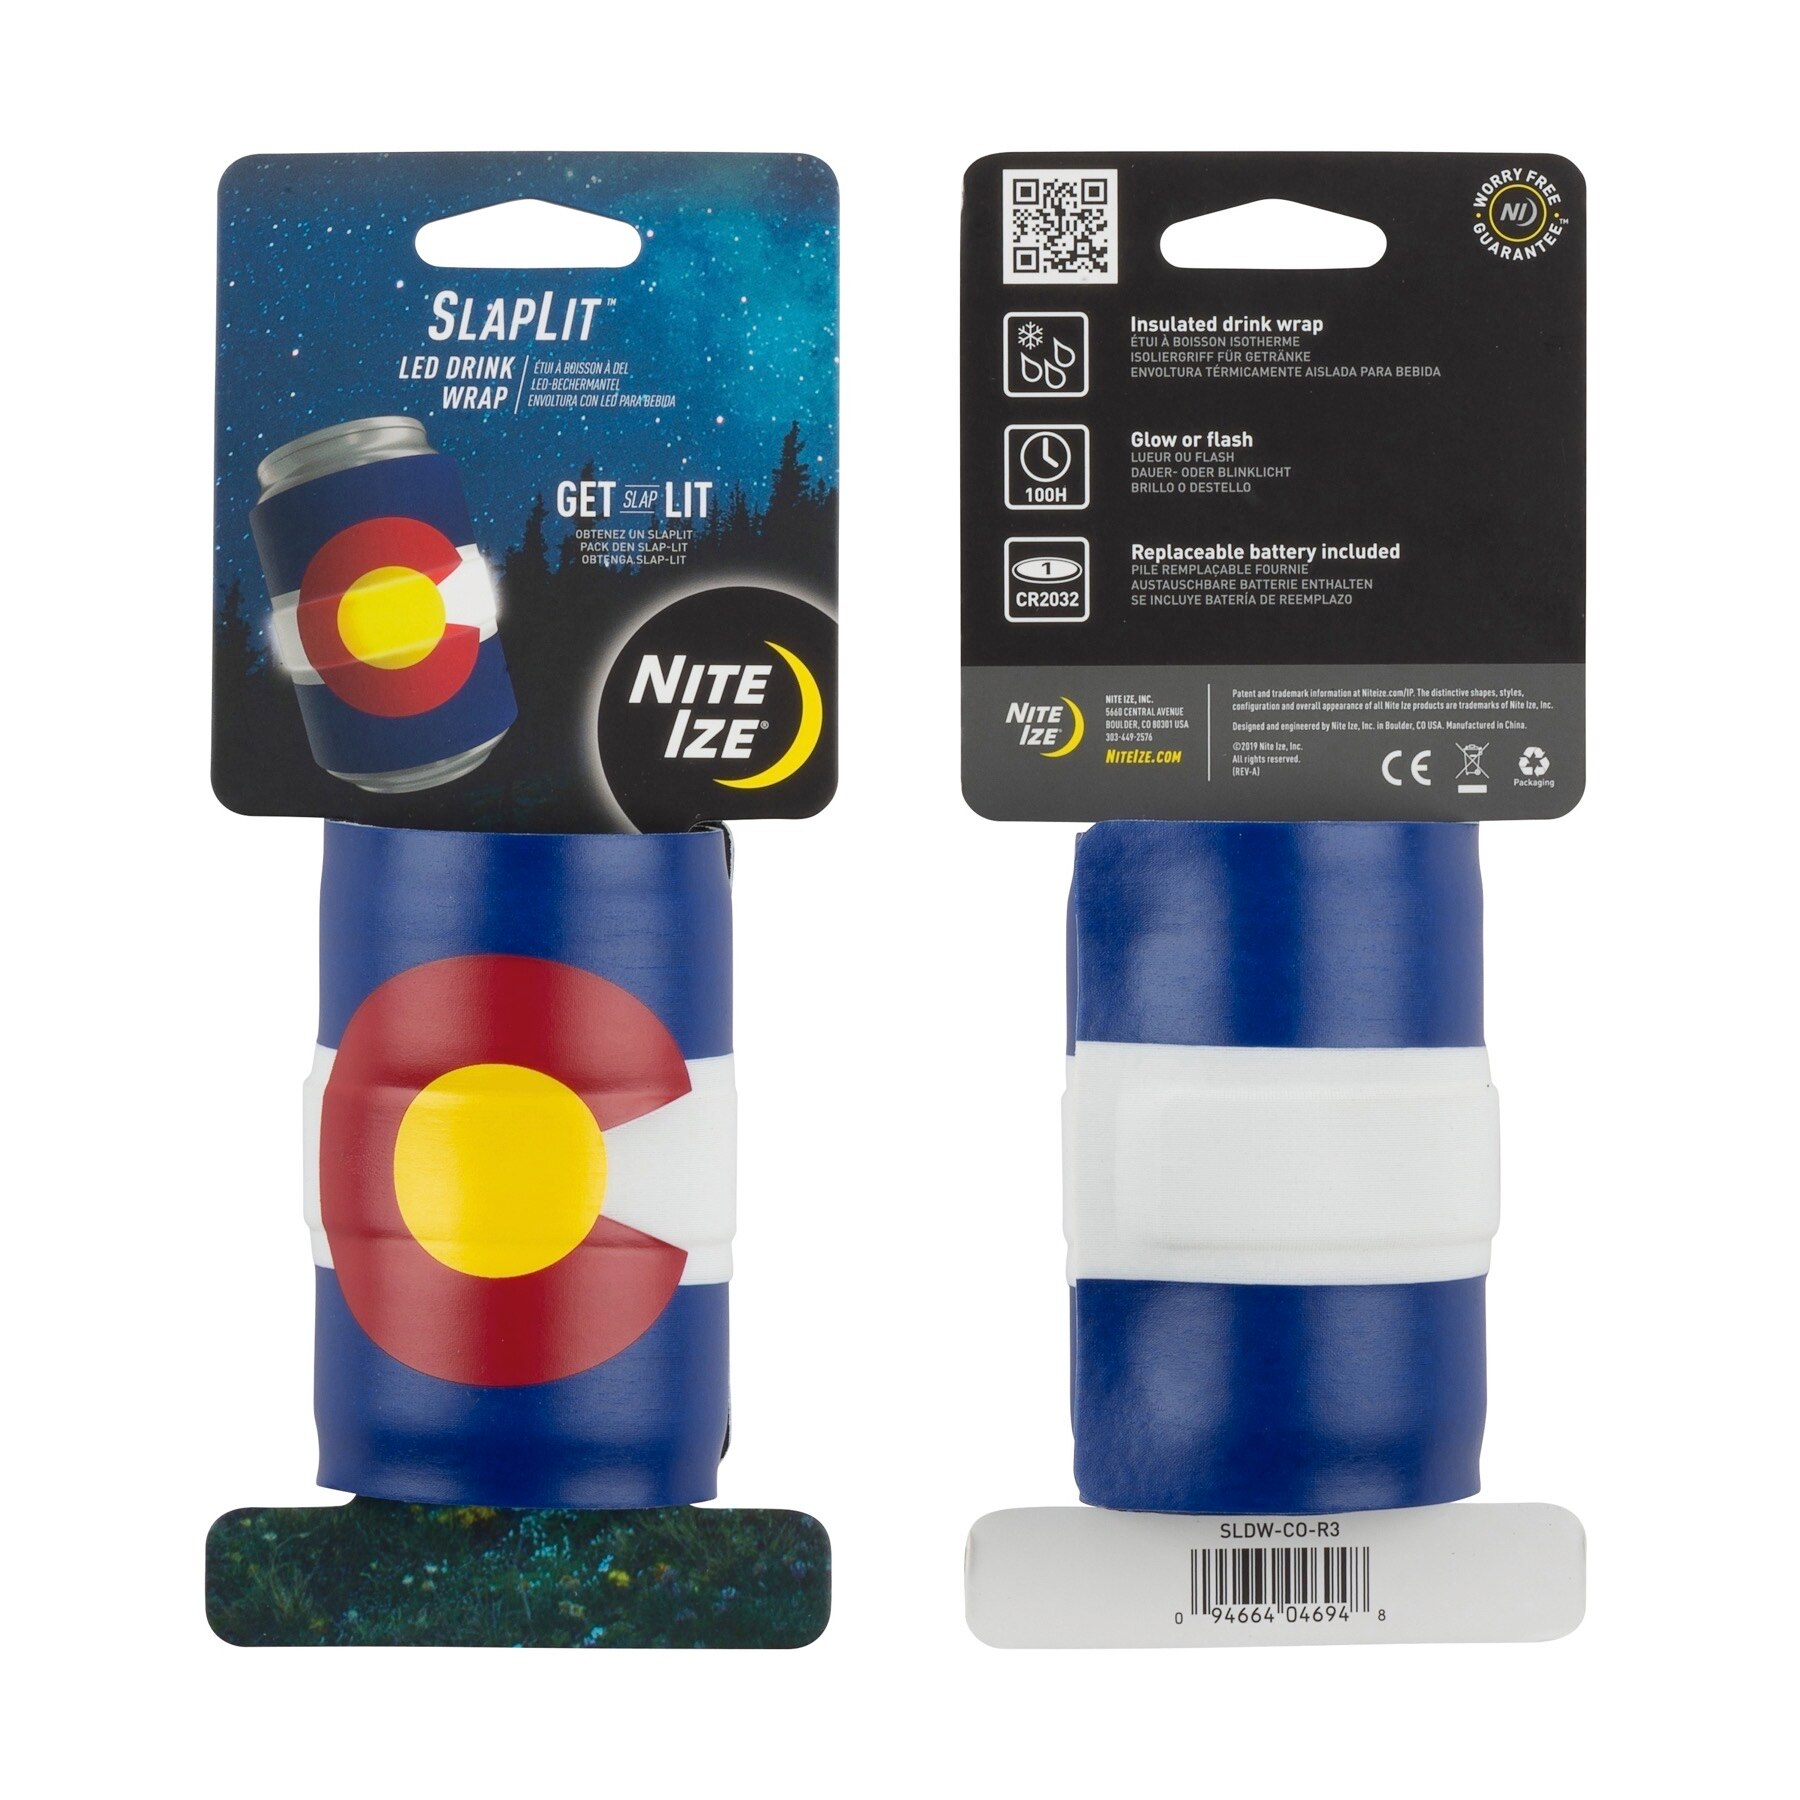 Nite Ize SlapLit LED Colorado Easy to Use Neoprene Insulated Light Up Drink Wrap